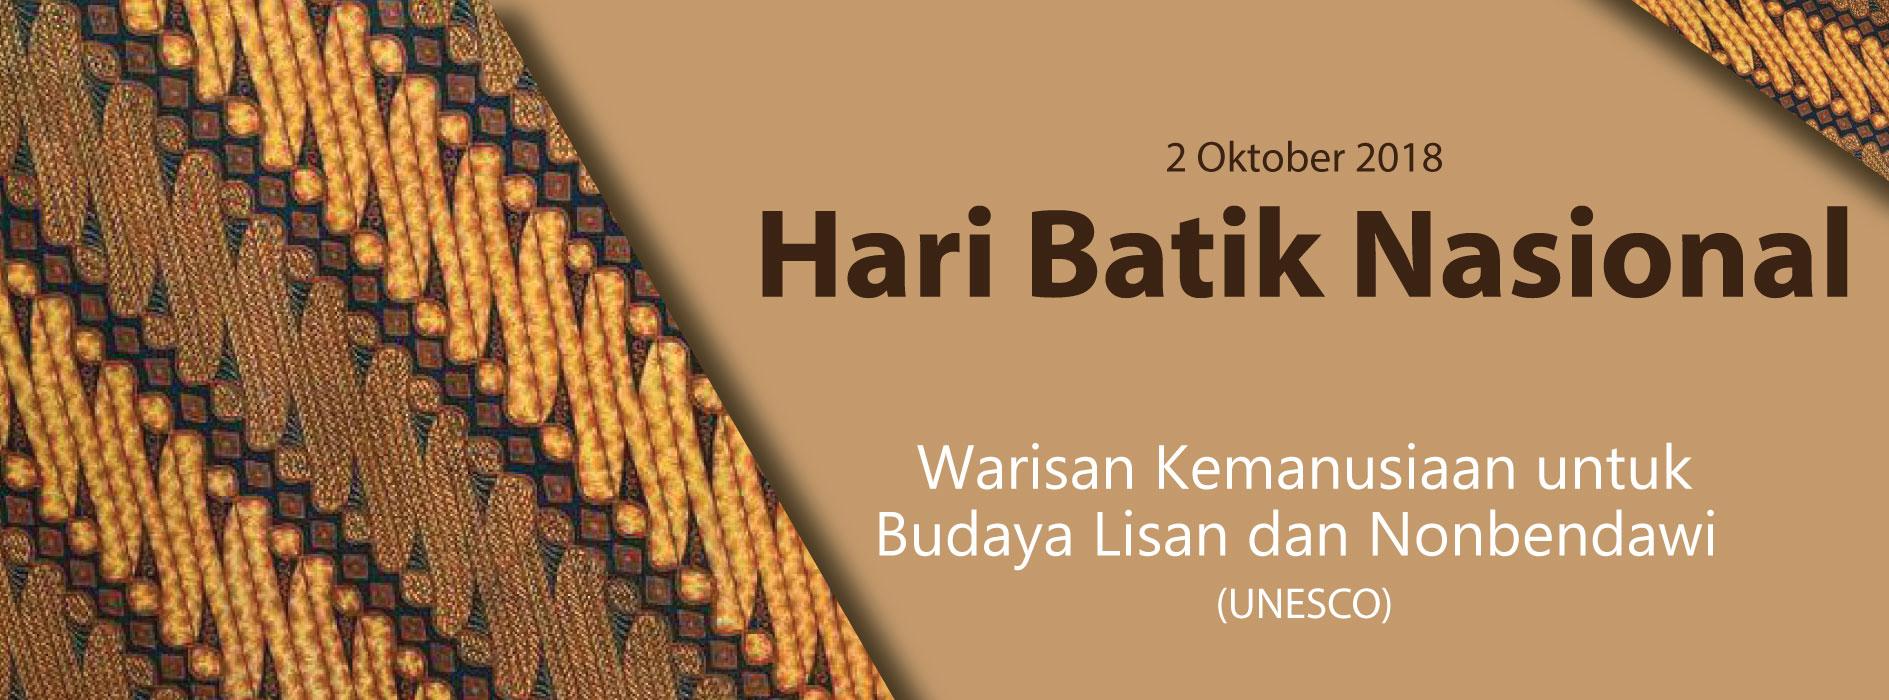 Web-banner-Hari-Batik-NAsional_2018 sekolah Tirtamarta BPK Penabur Jakarta Pondok Indah Cinere Depok